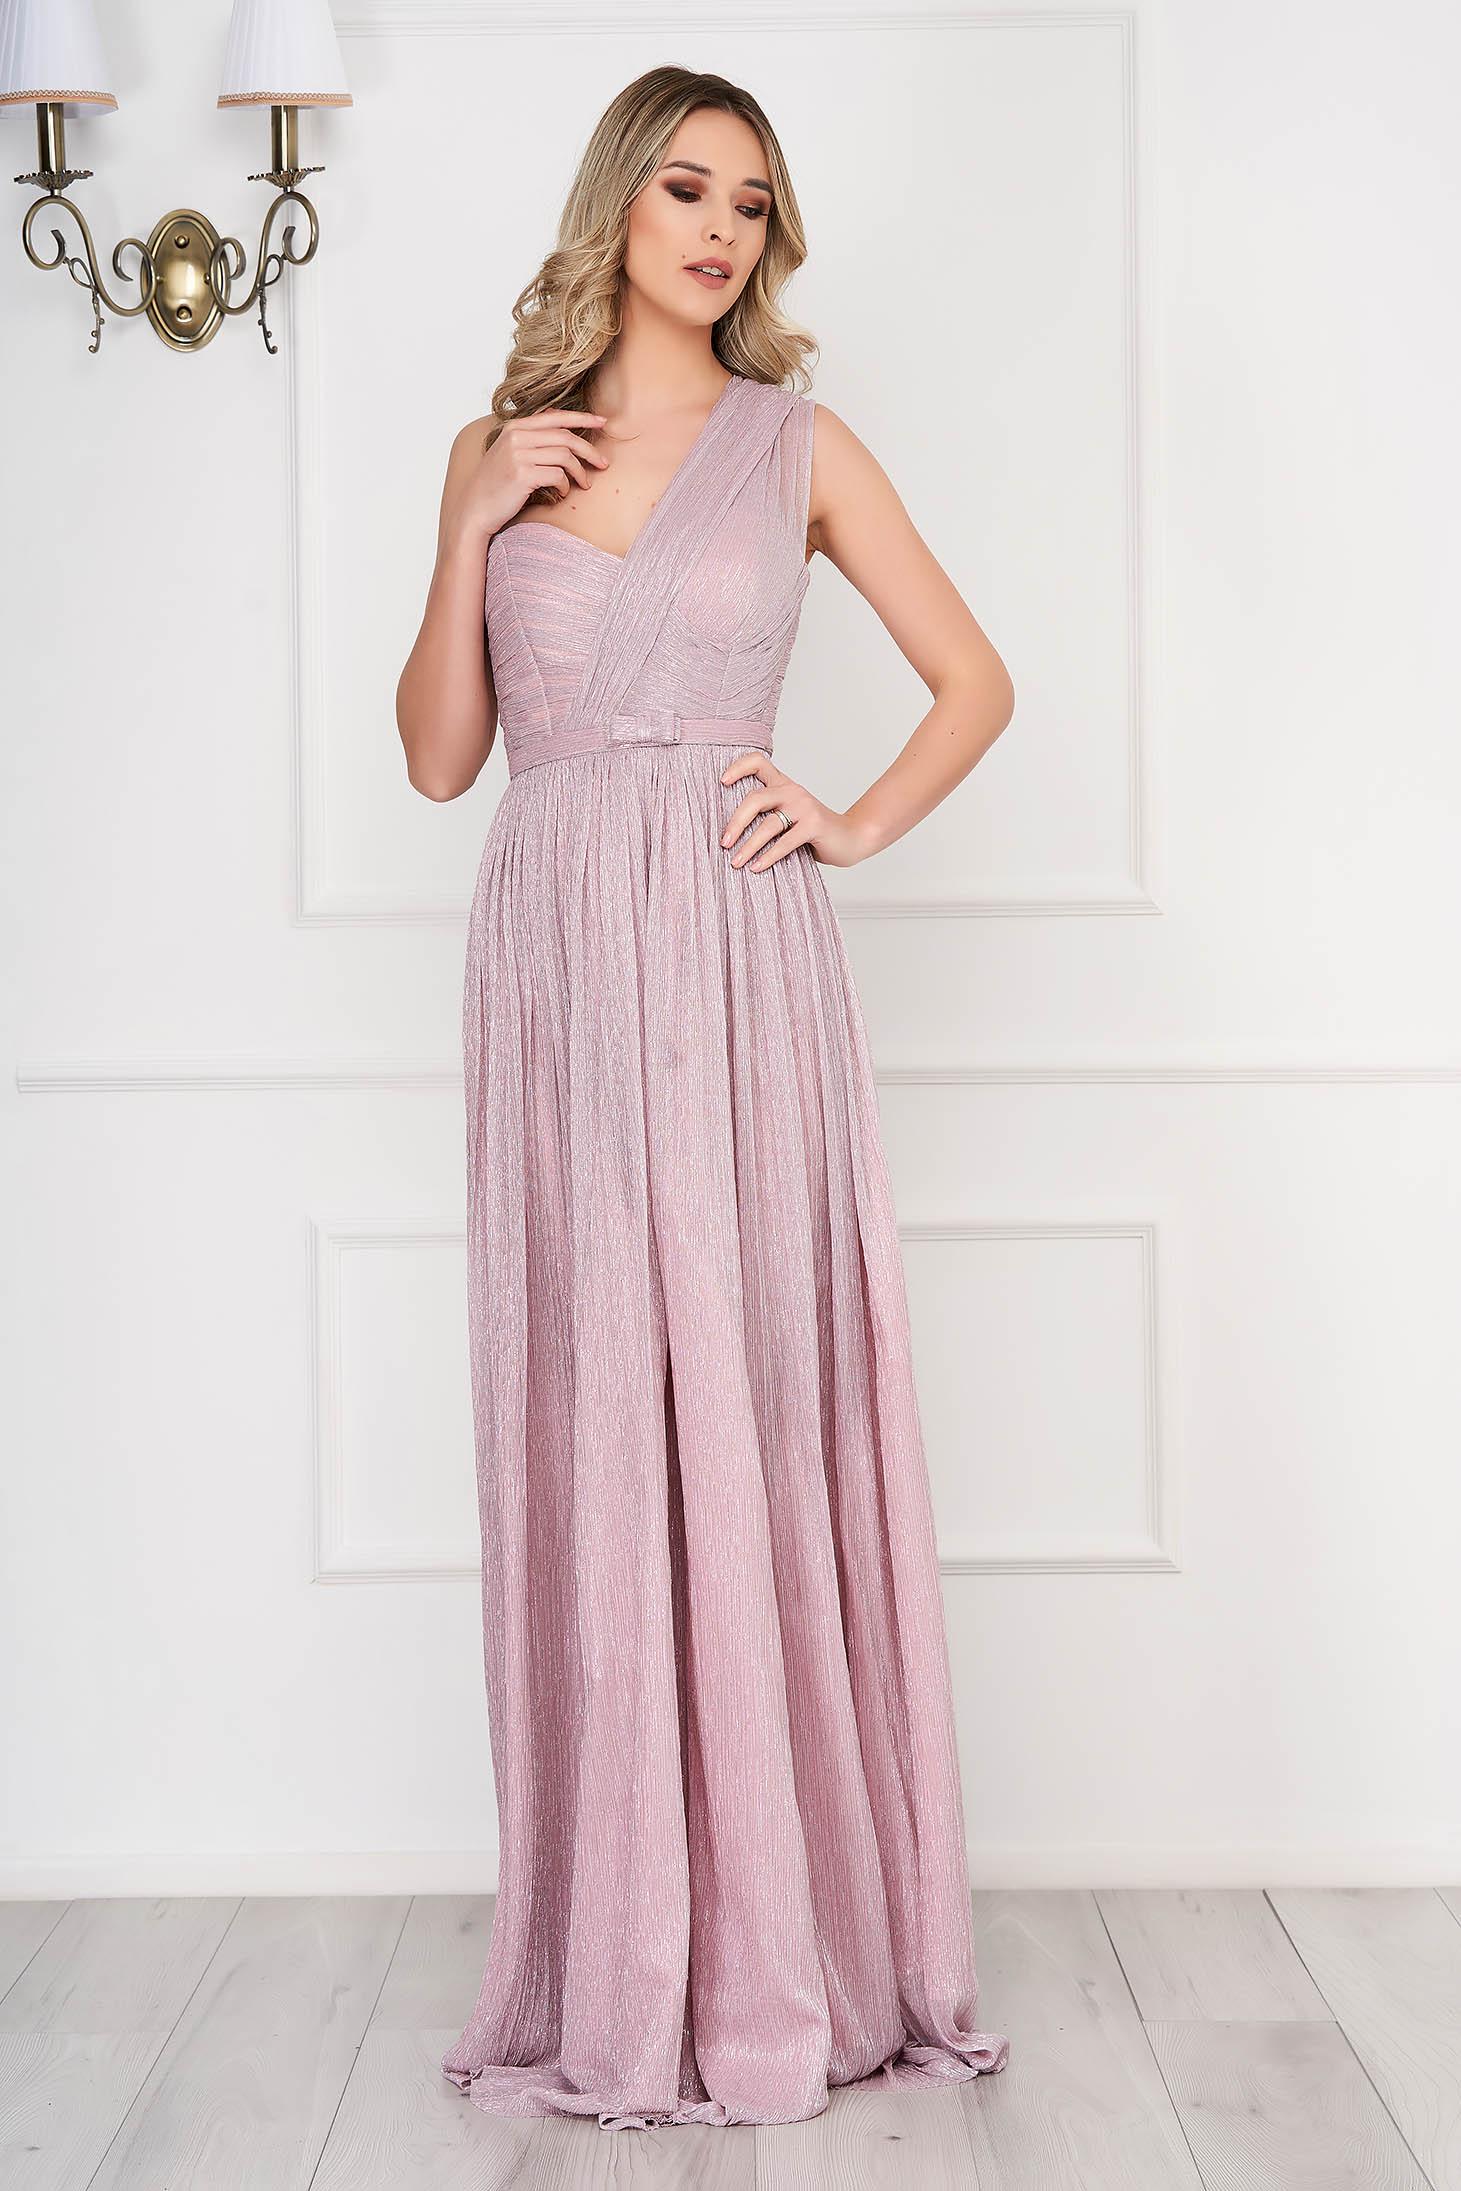 Rochie Ana Radu roz deschis de lux in clos din tesatura metalica cu luciu captusita pe interior accesorizata cu cordon